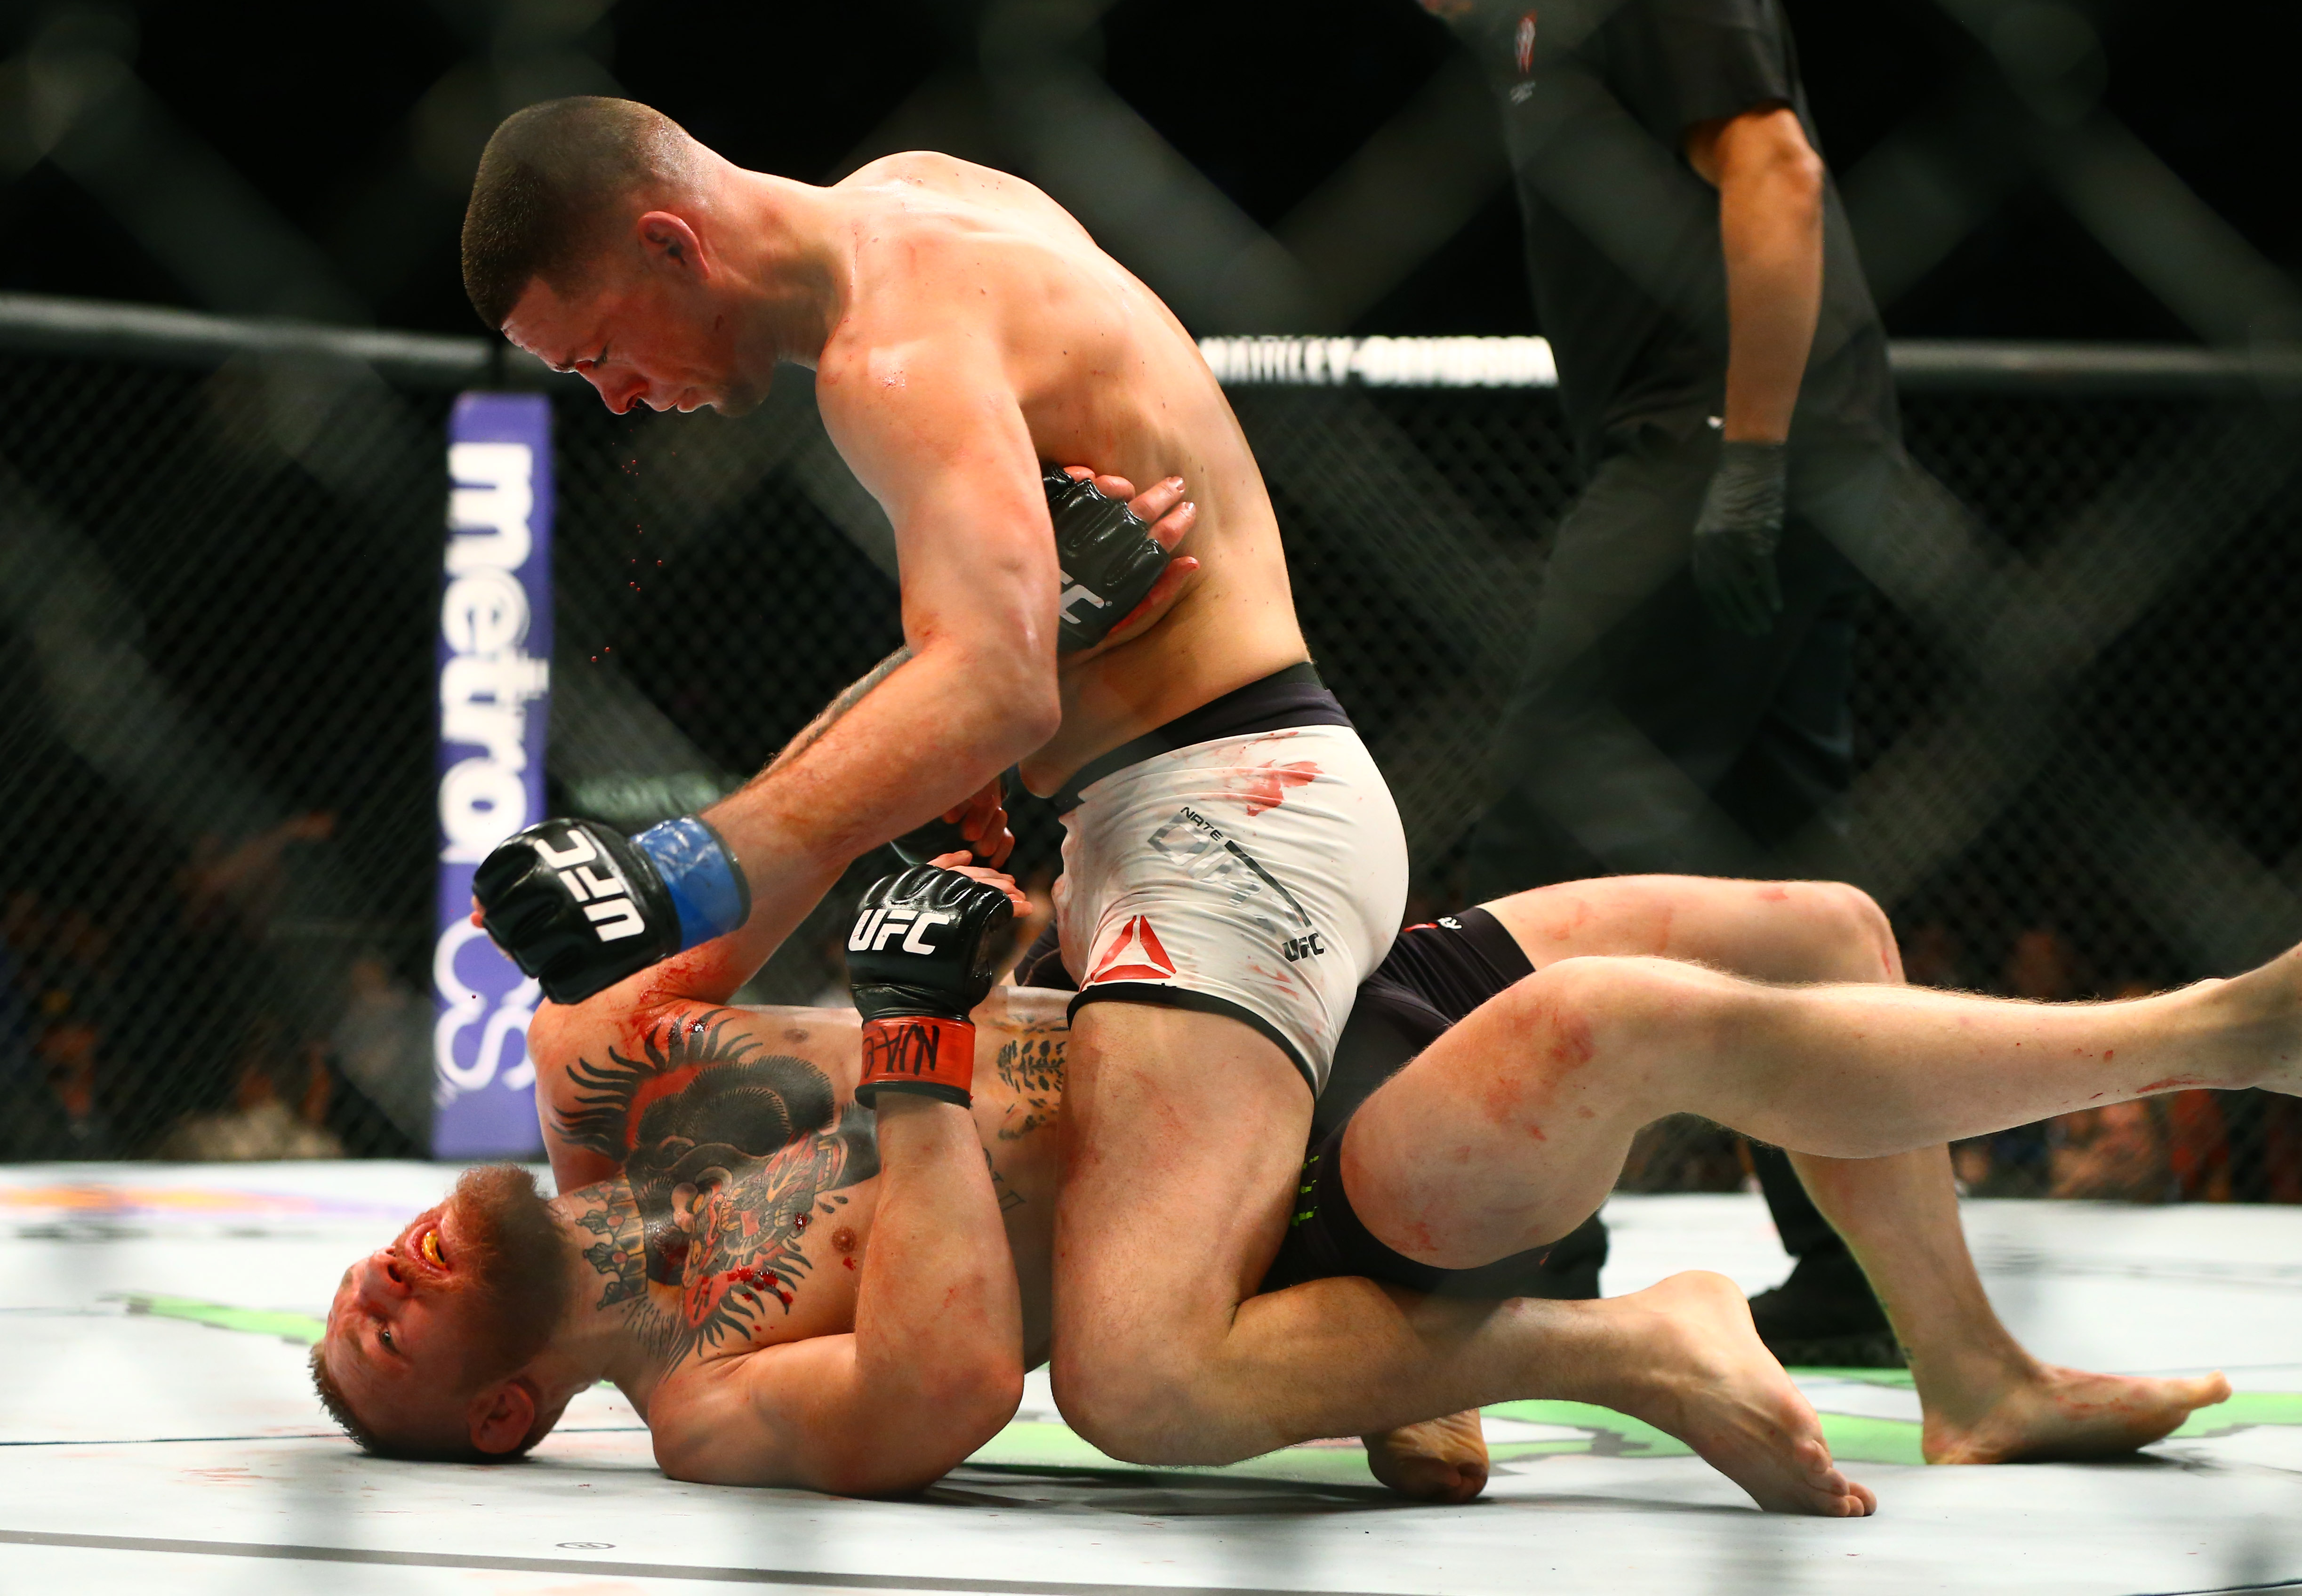 MMA: UFC 196-McGregor vs Diaz